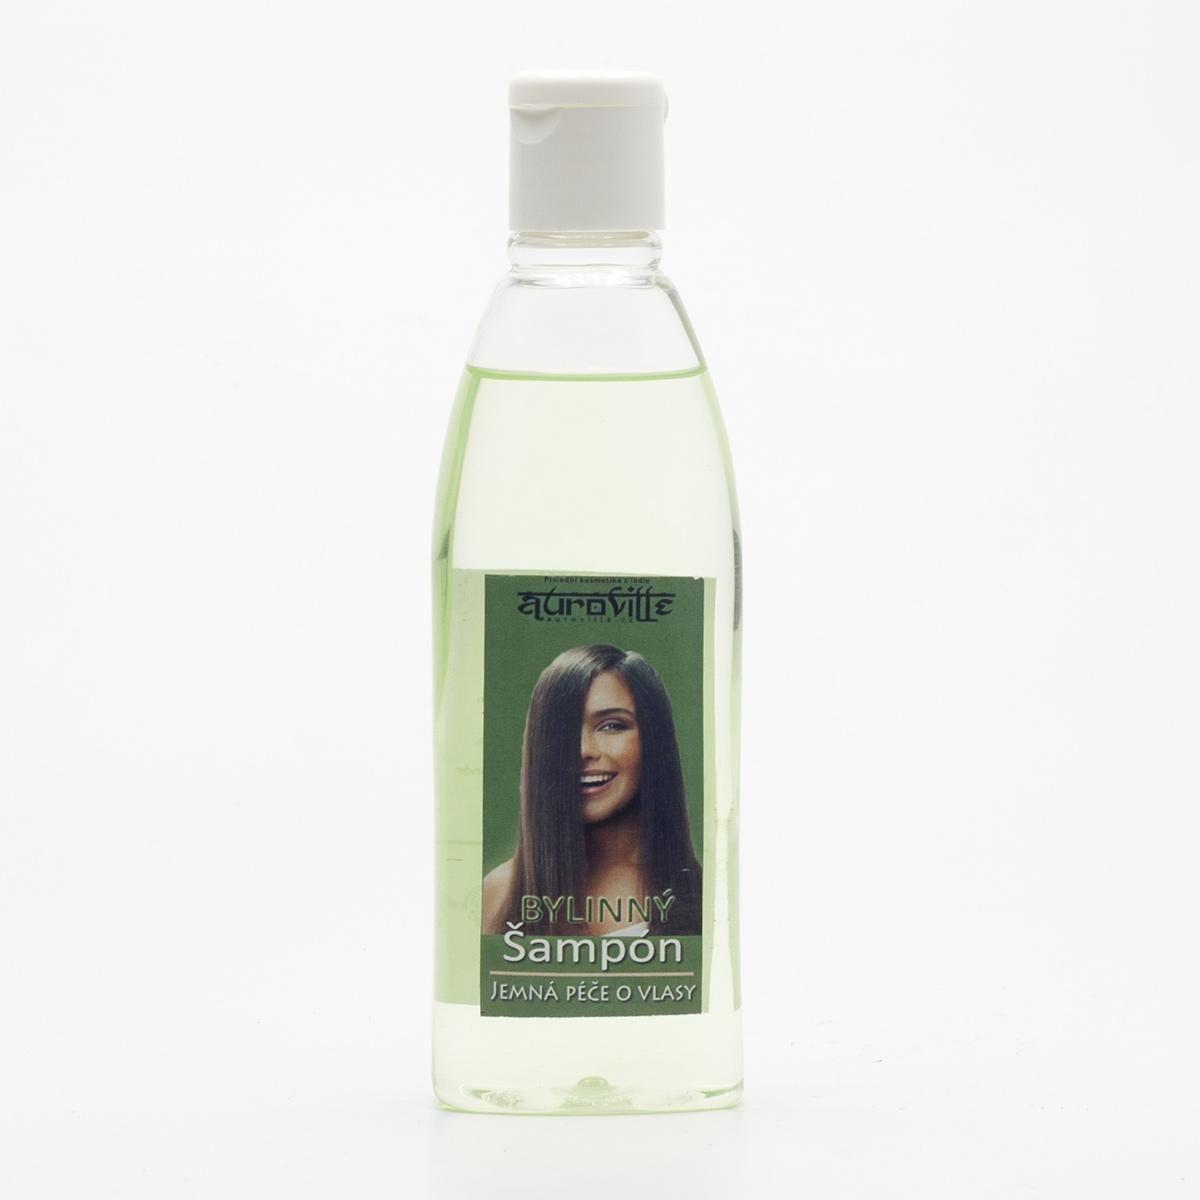 Auroville Bylinný šampon 100 ml